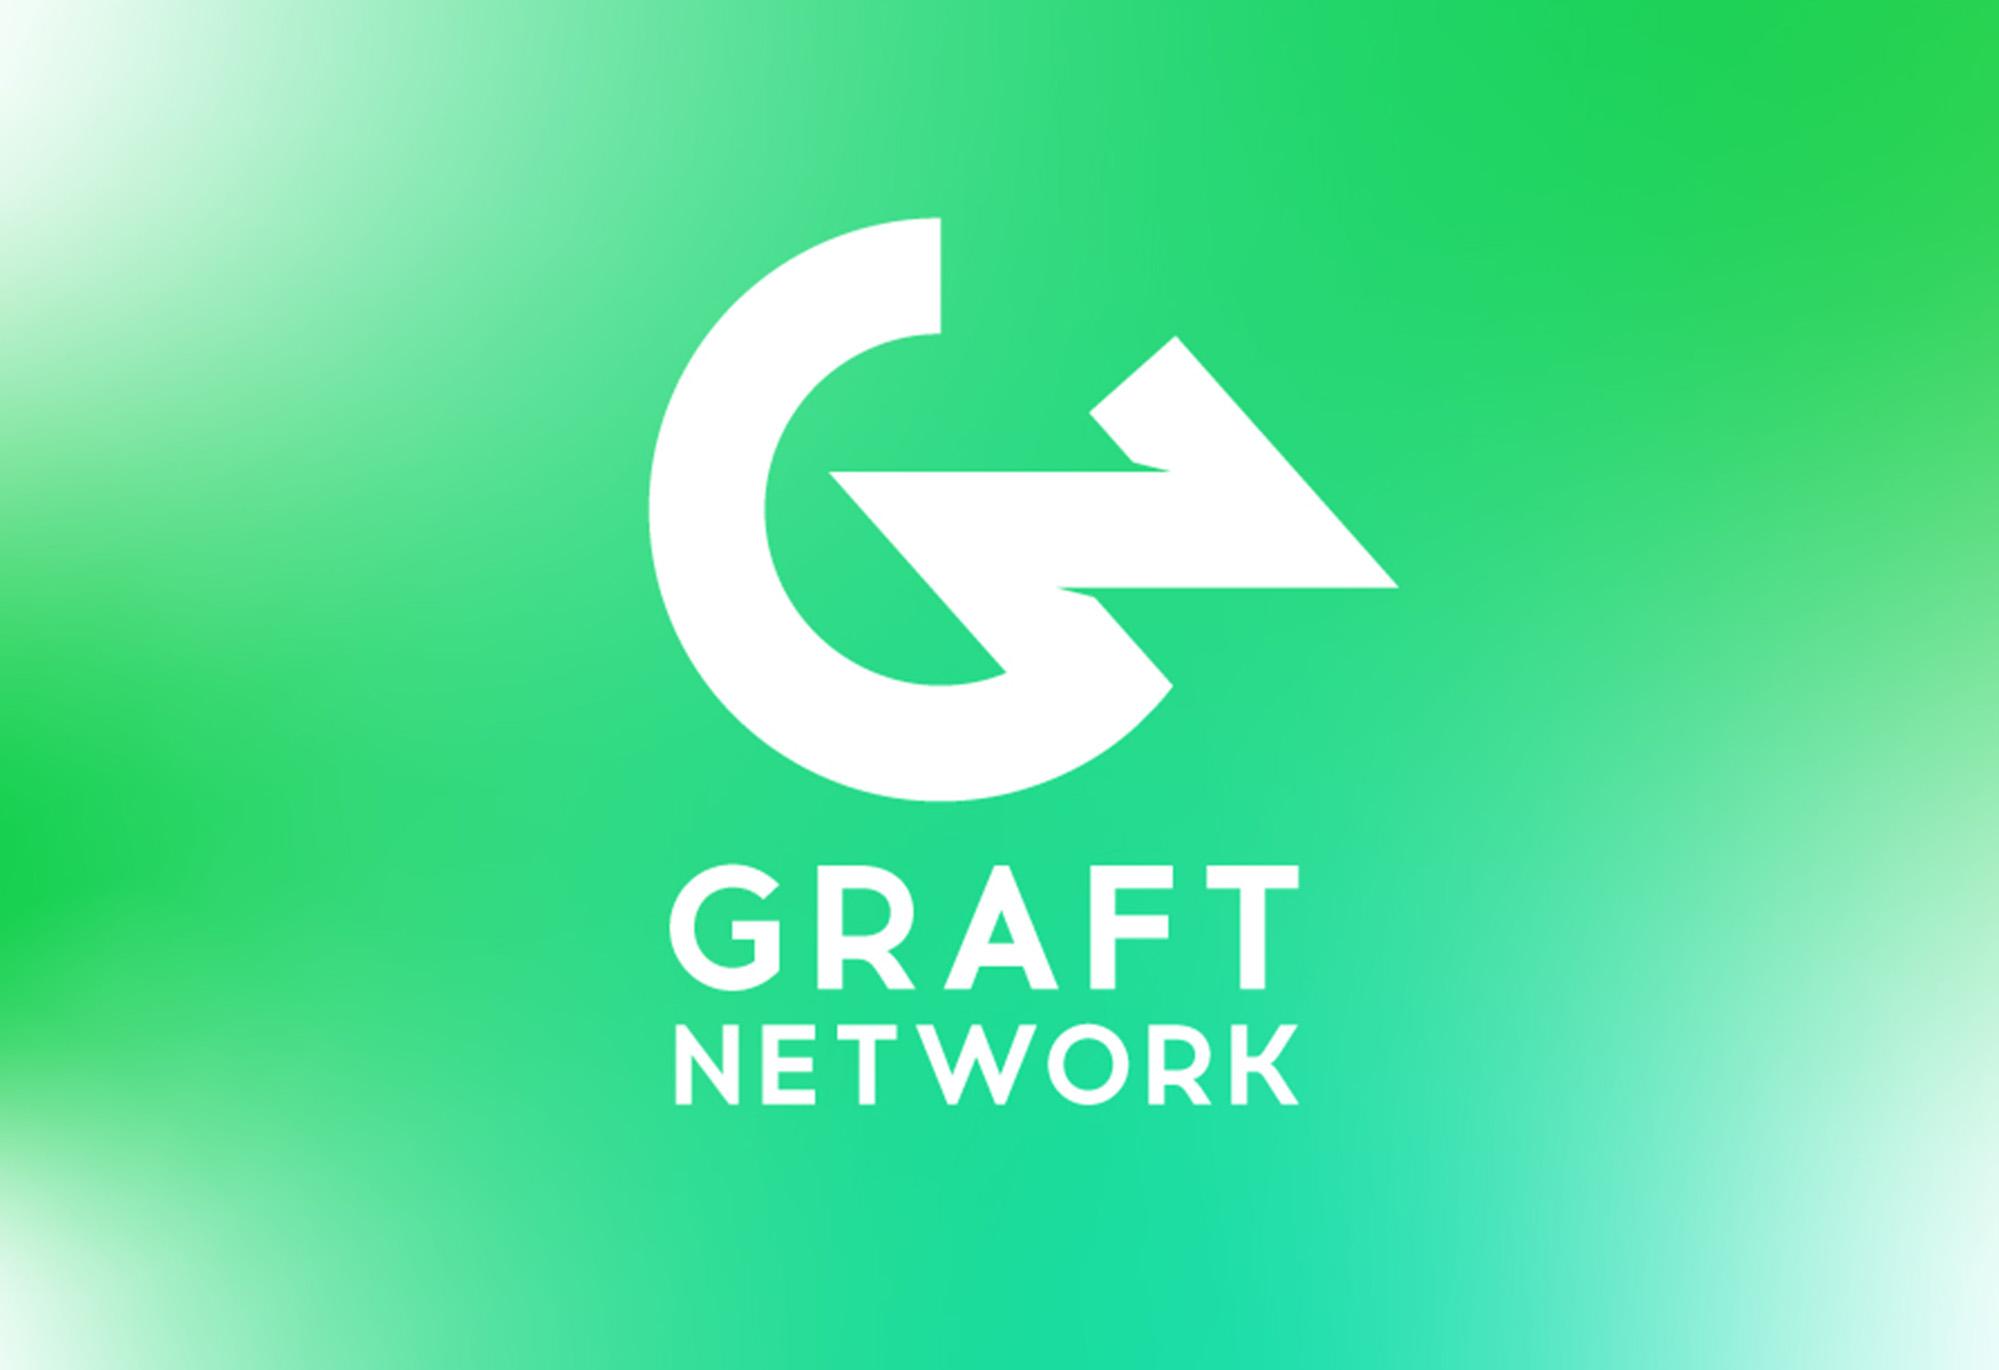 Graft Network logo